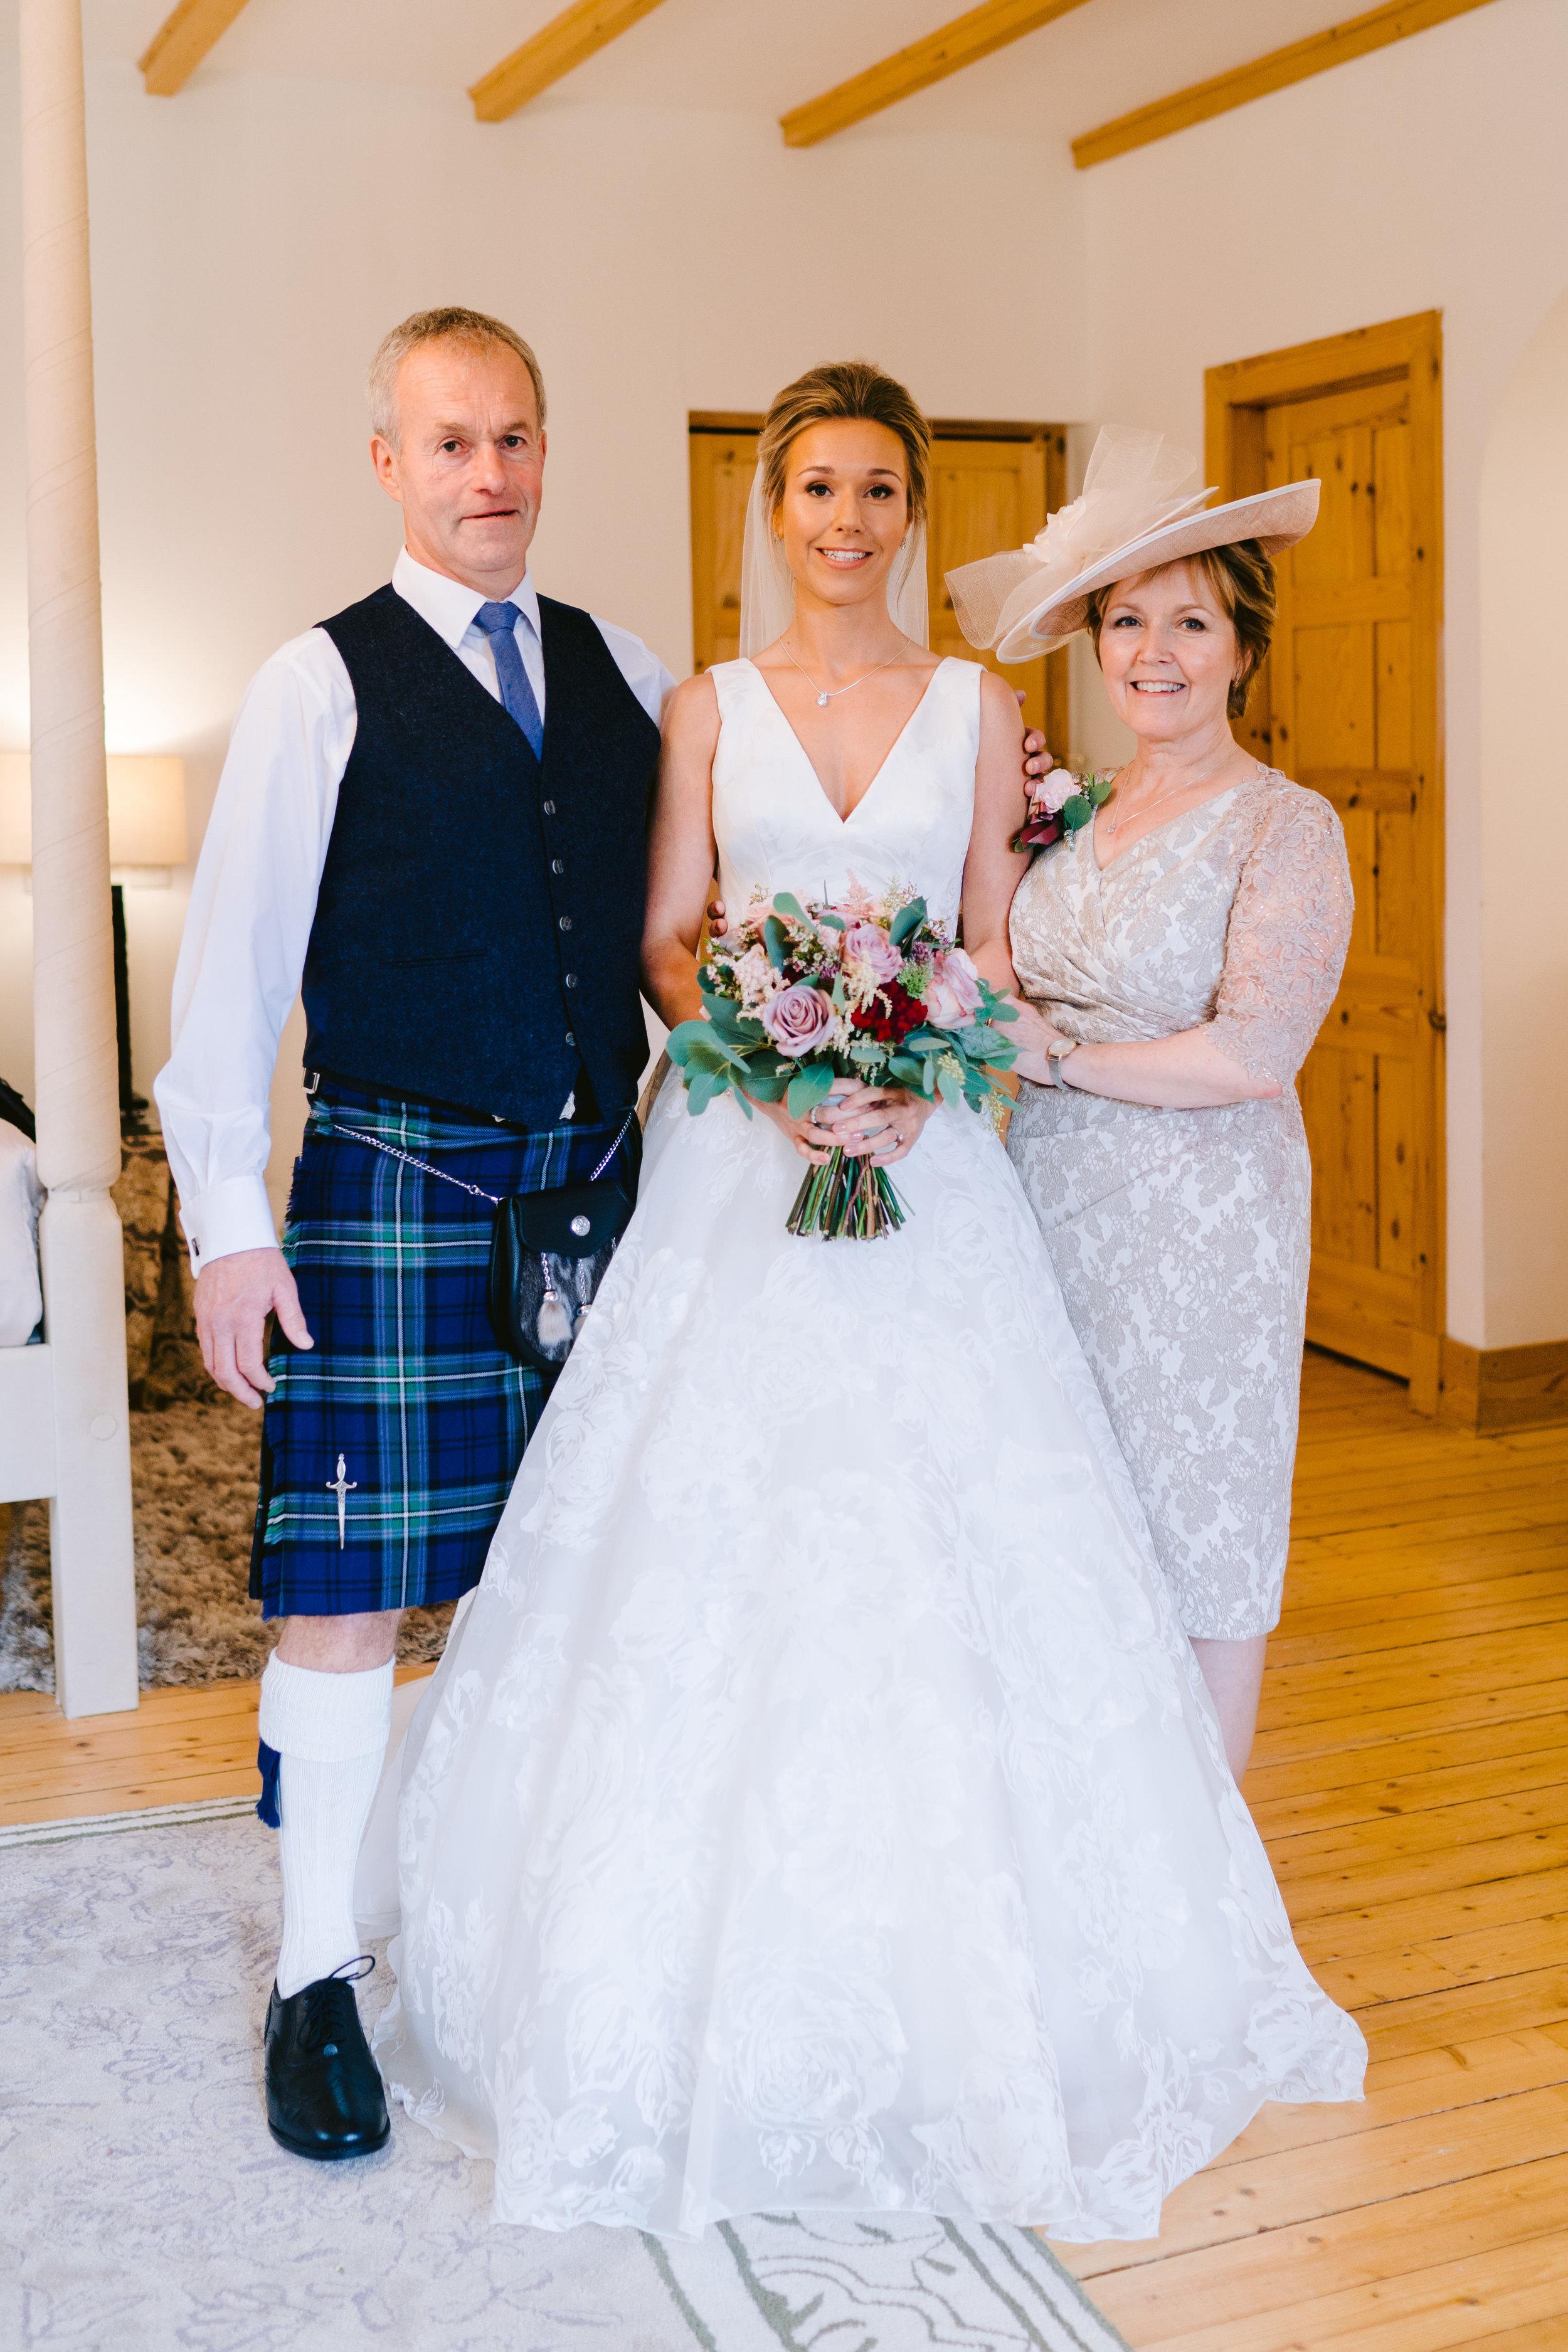 Karin_and_Shauns_Wedding_-_Achnagairn_Castle_-_www.eilidhrobertson.co.uk-325.jpg